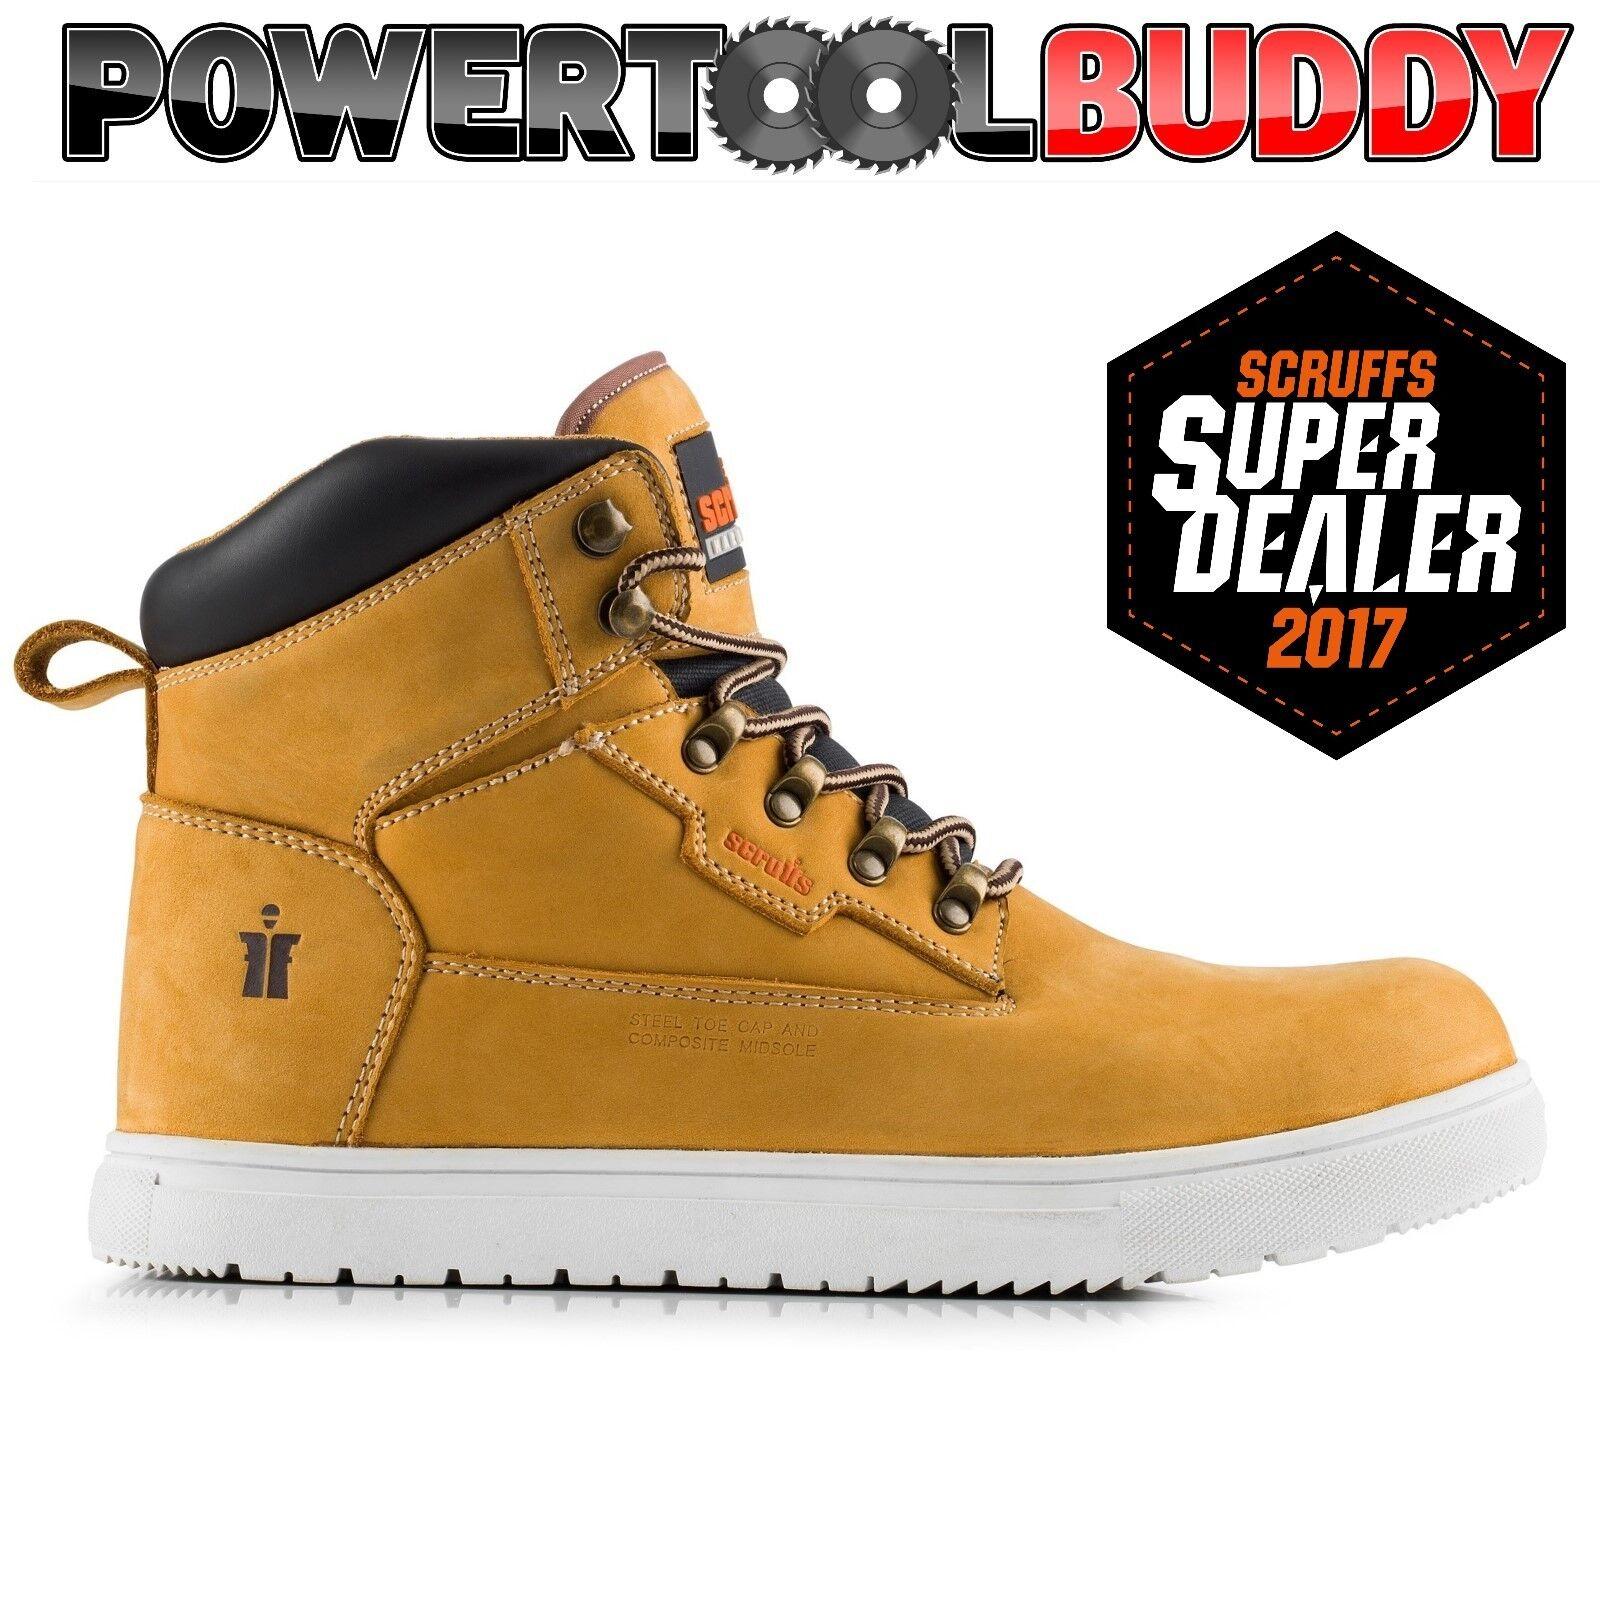 Scruffs Twister Sport Mens Tan Work Site Safety Stiefel Steel Toe Cap B5